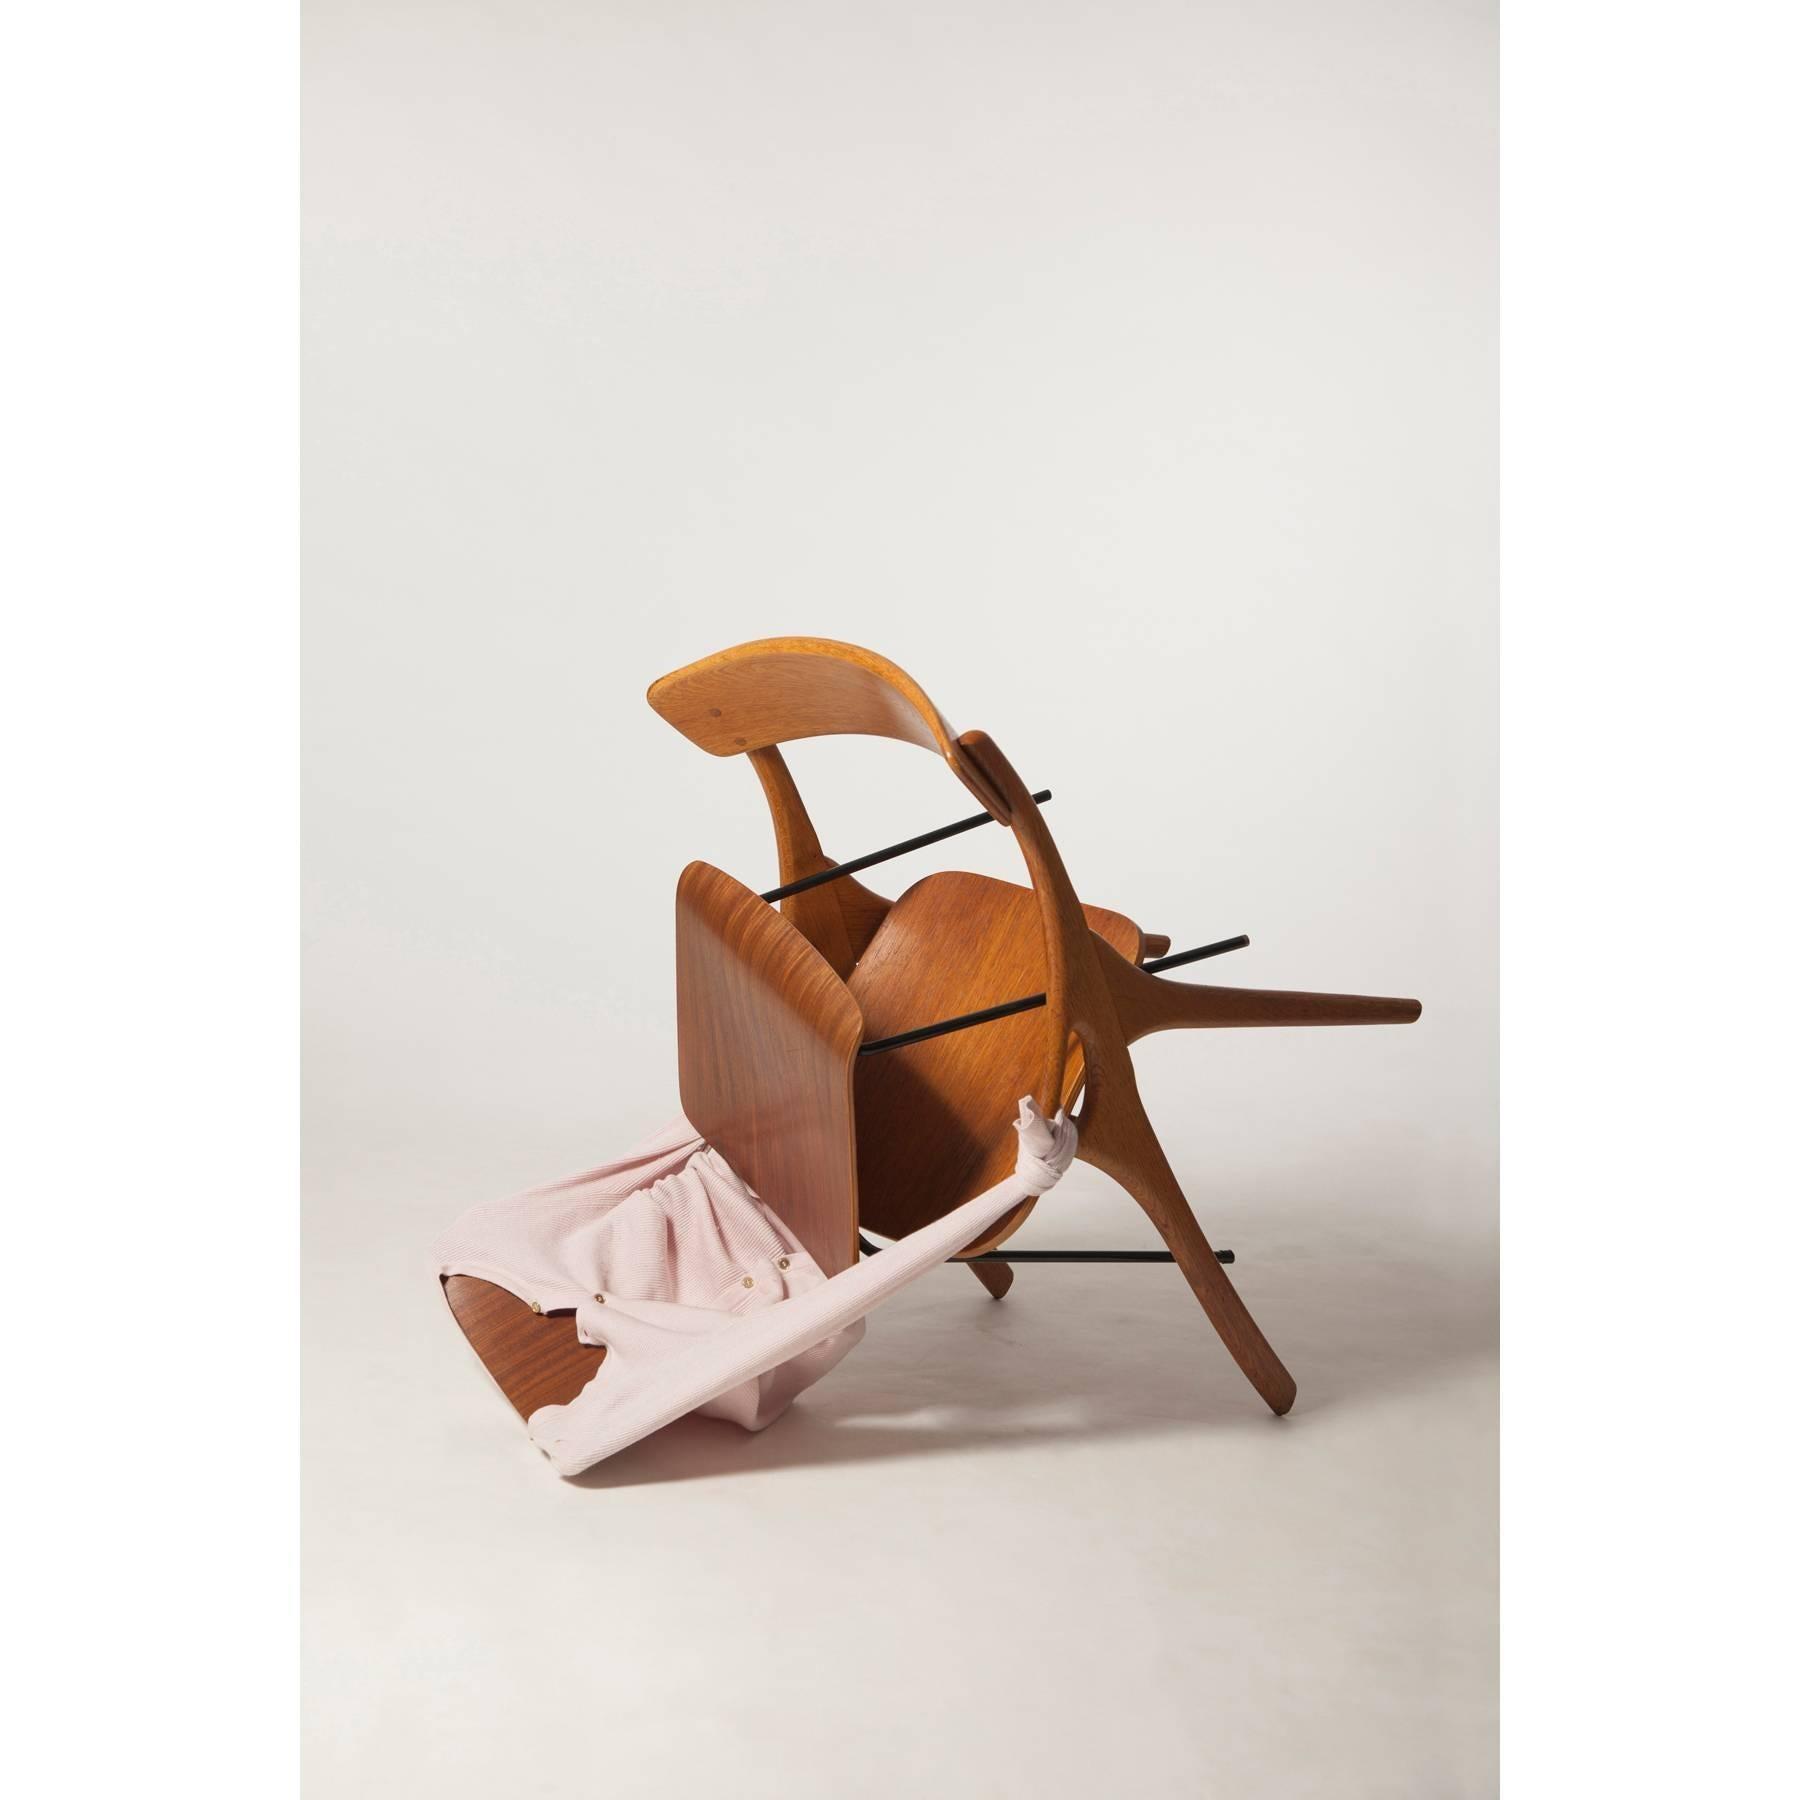 Chair Affair 01 Print by Lucas Maassen and Magriet Craens 2015 For Sale  sc 1 st  1stDibs & Chair Affair 01 Print by Lucas Maassen and Magriet Craens 2015 For ...